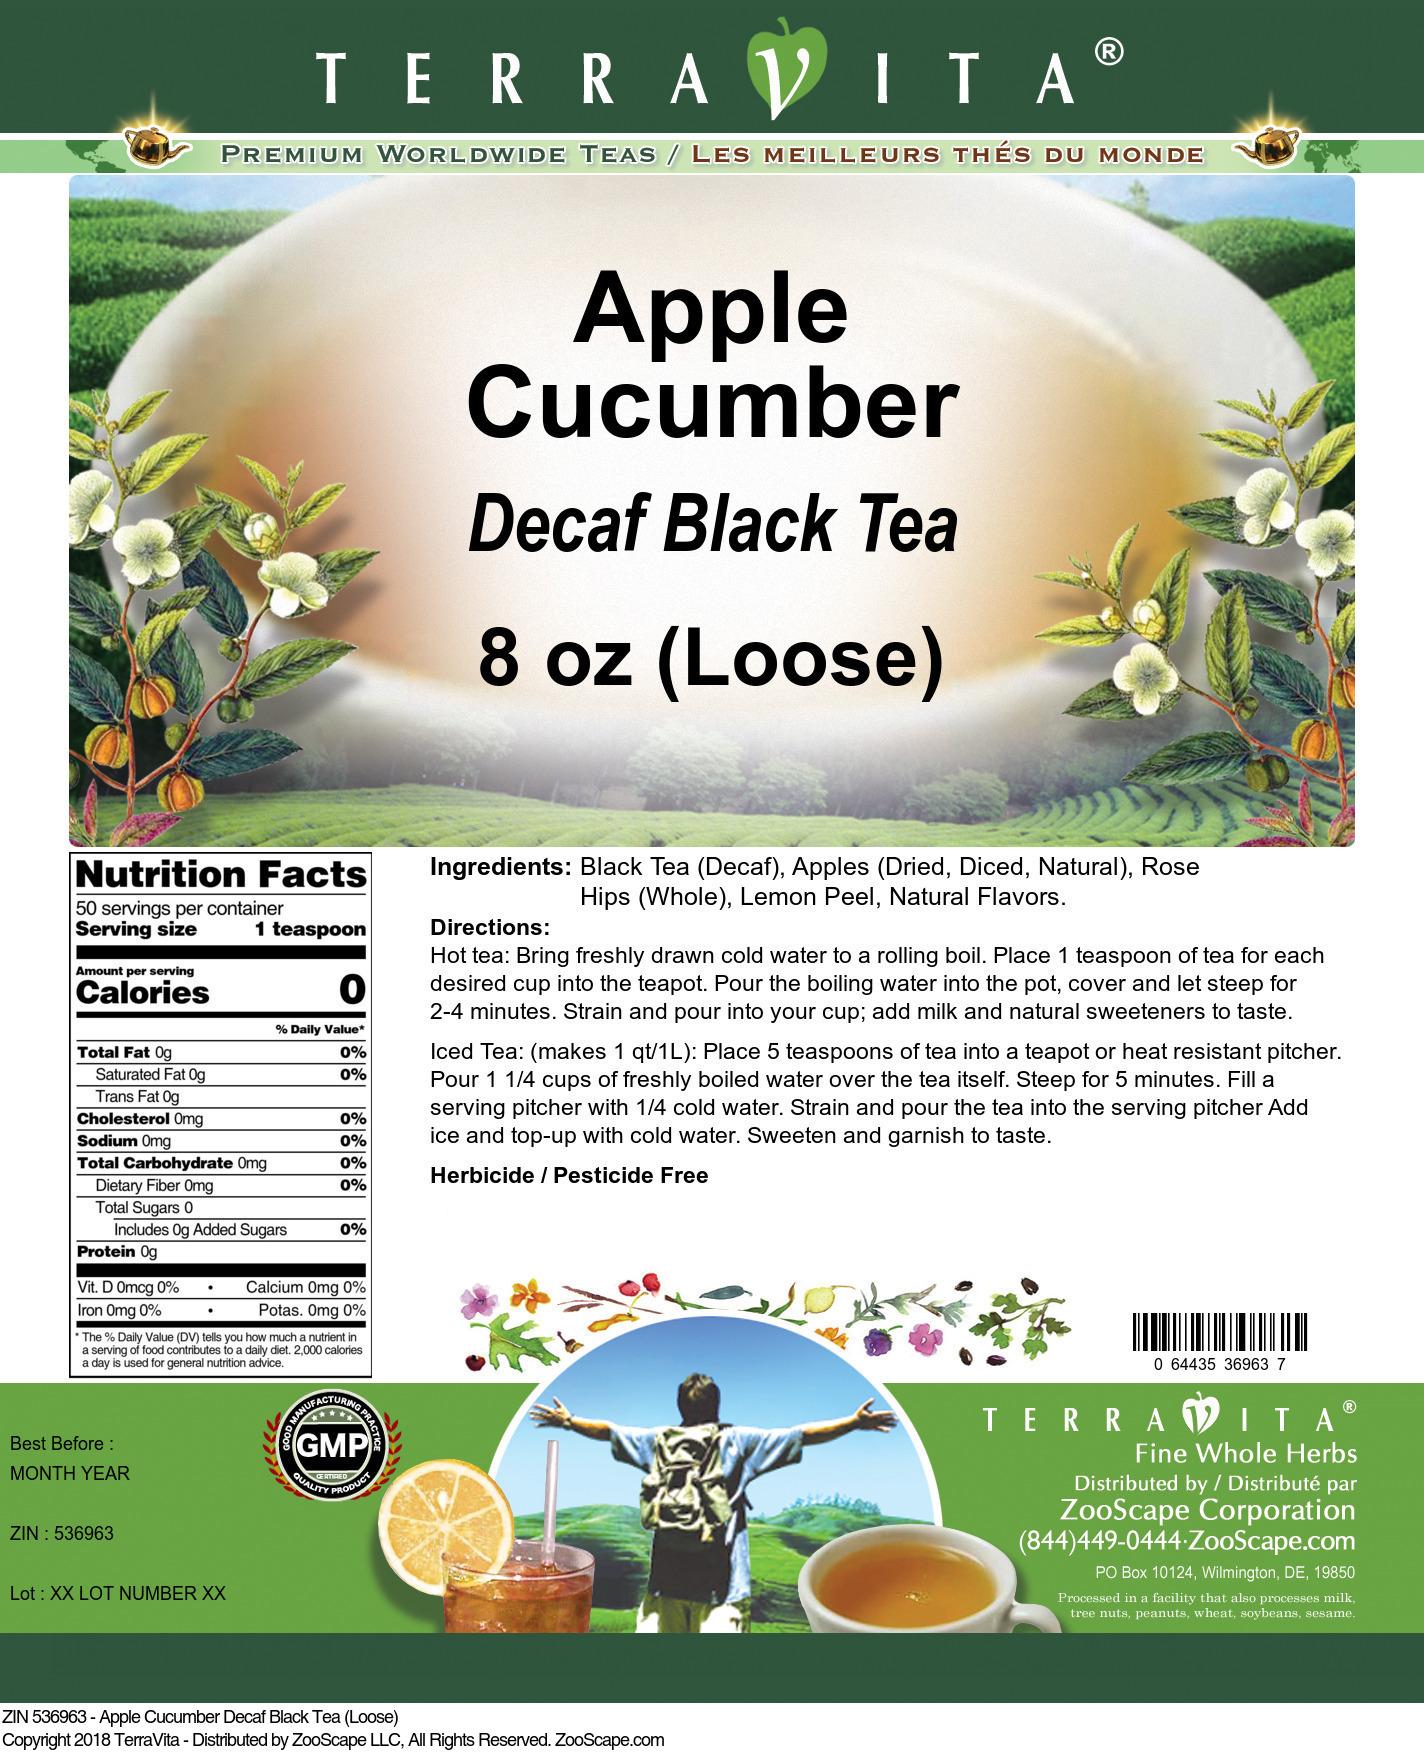 Apple Cucumber Decaf Black Tea (Loose)